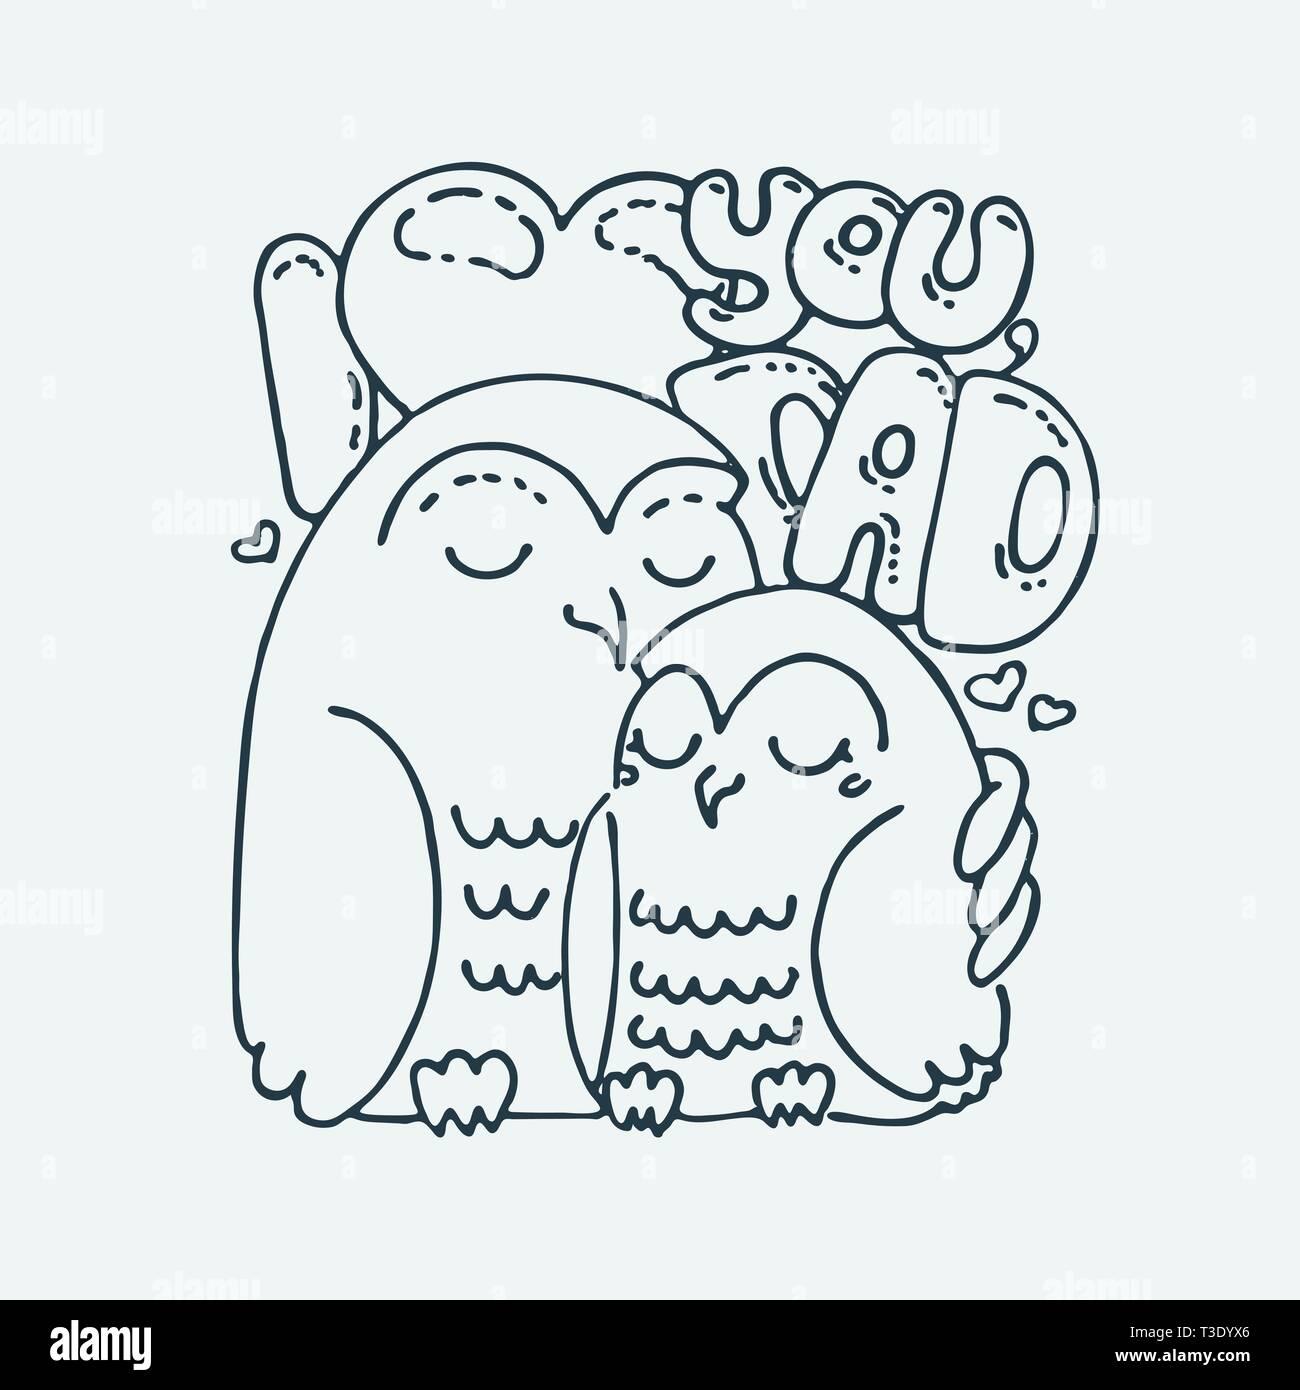 Te Amo Papa Caricatura Del Animal Imagenes Predisenadas